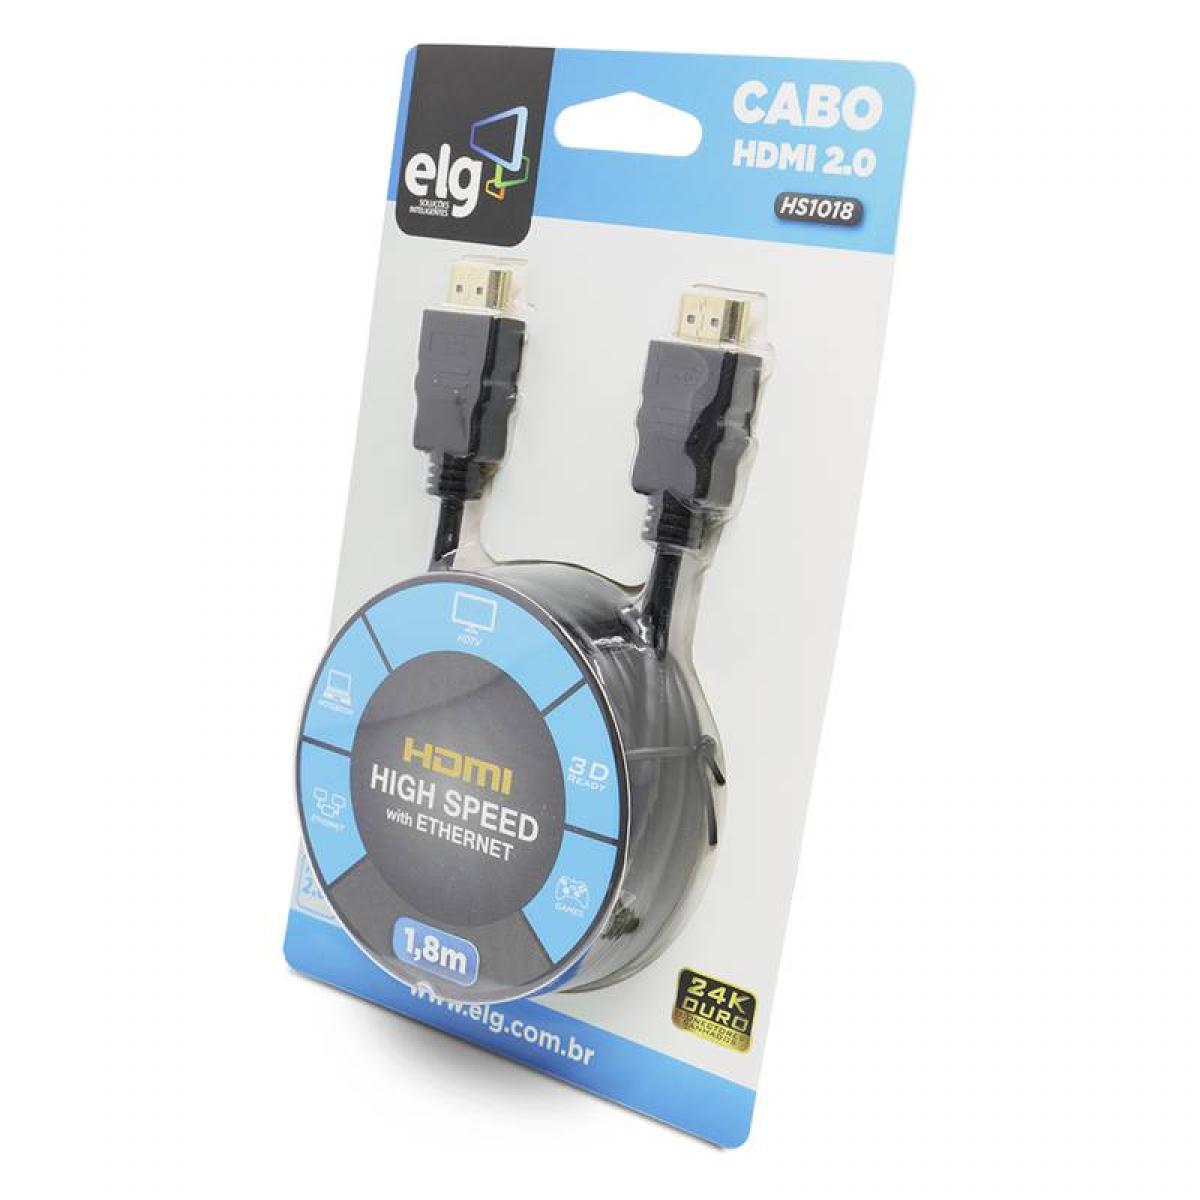 Cabo HDMI ELG 2.0, 4K ULTRA HD 3D, 1,8 Metros, HS1018